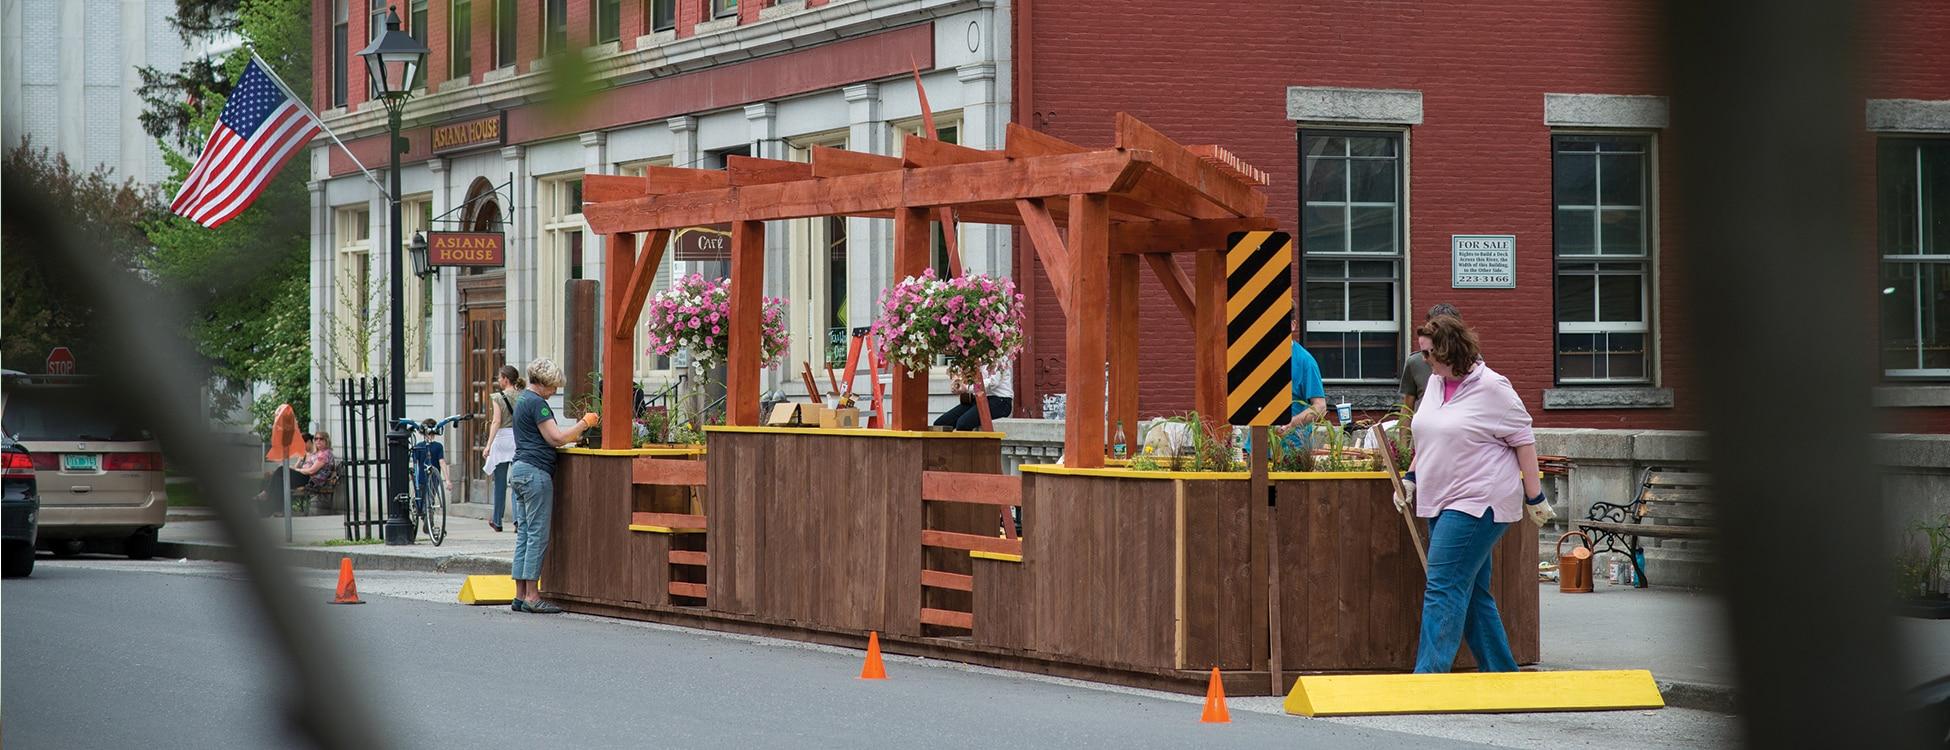 Installing parklet, Montpelier, Vermont, teamwork, construction